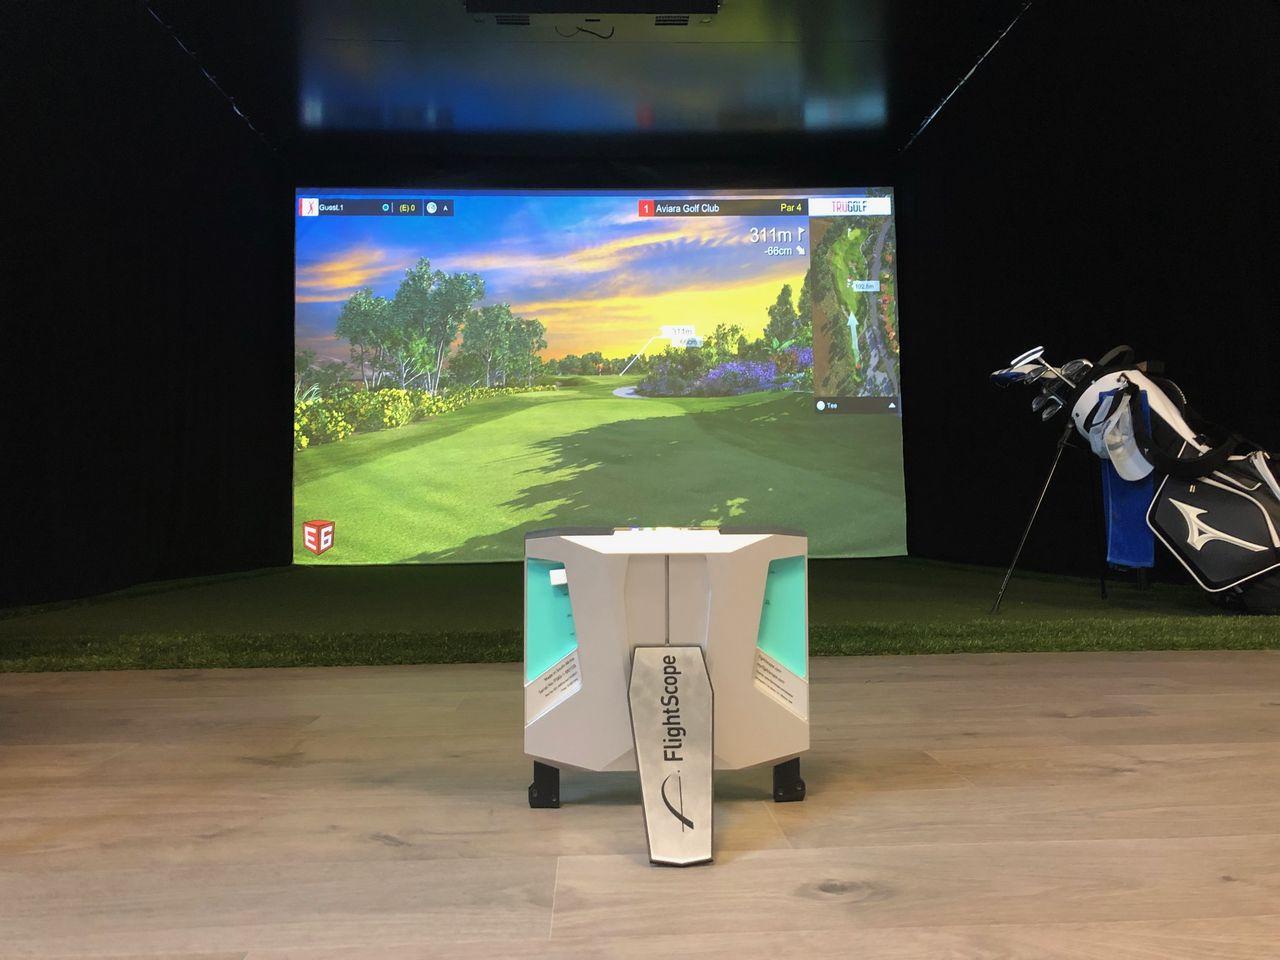 x3 simulator, putt simulator (exputt) sportscoach systems, trugolf, Dutch Golf Company, indoorgolf, golfsimulator, golfprofessional, Goirle, Eindhoven